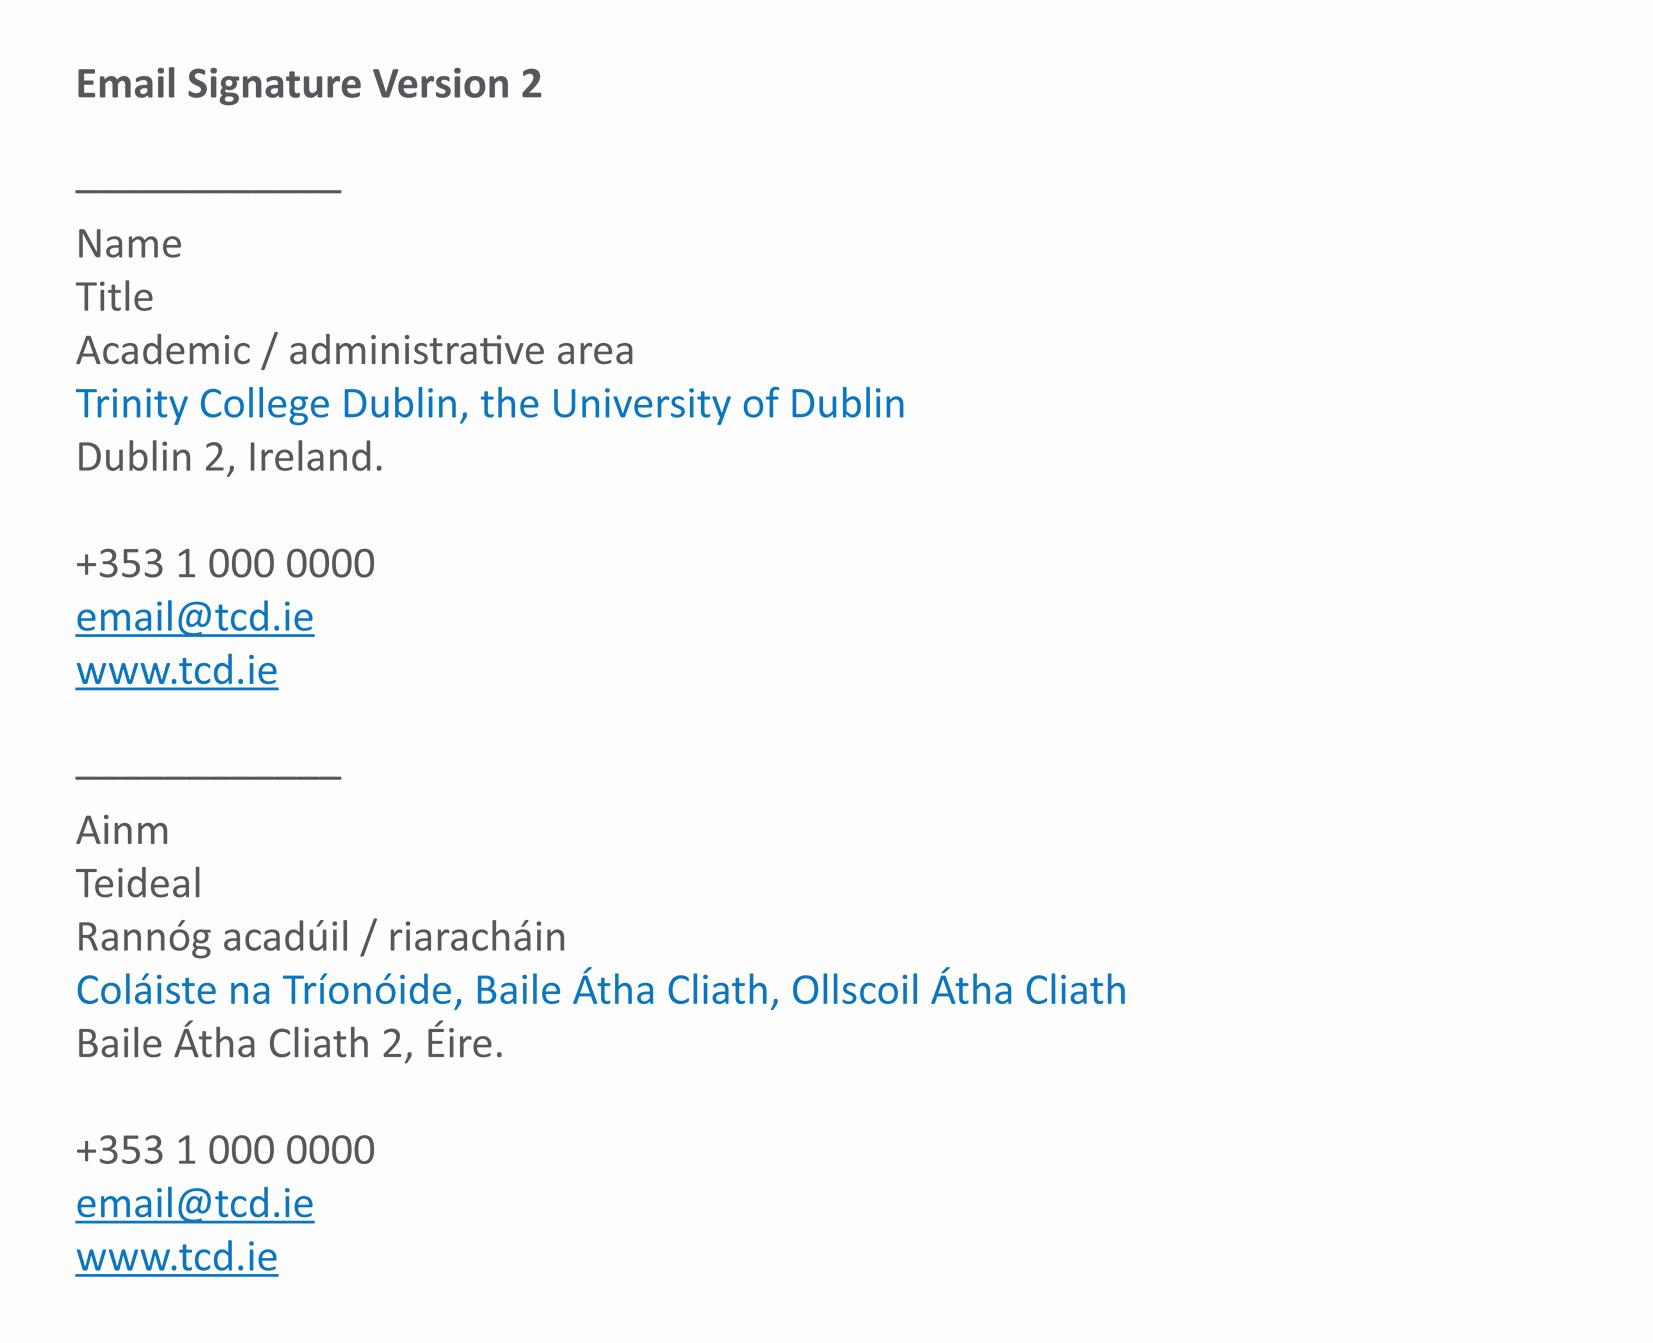 Email Signature for College Student Unique Identity Trinity College Dublin